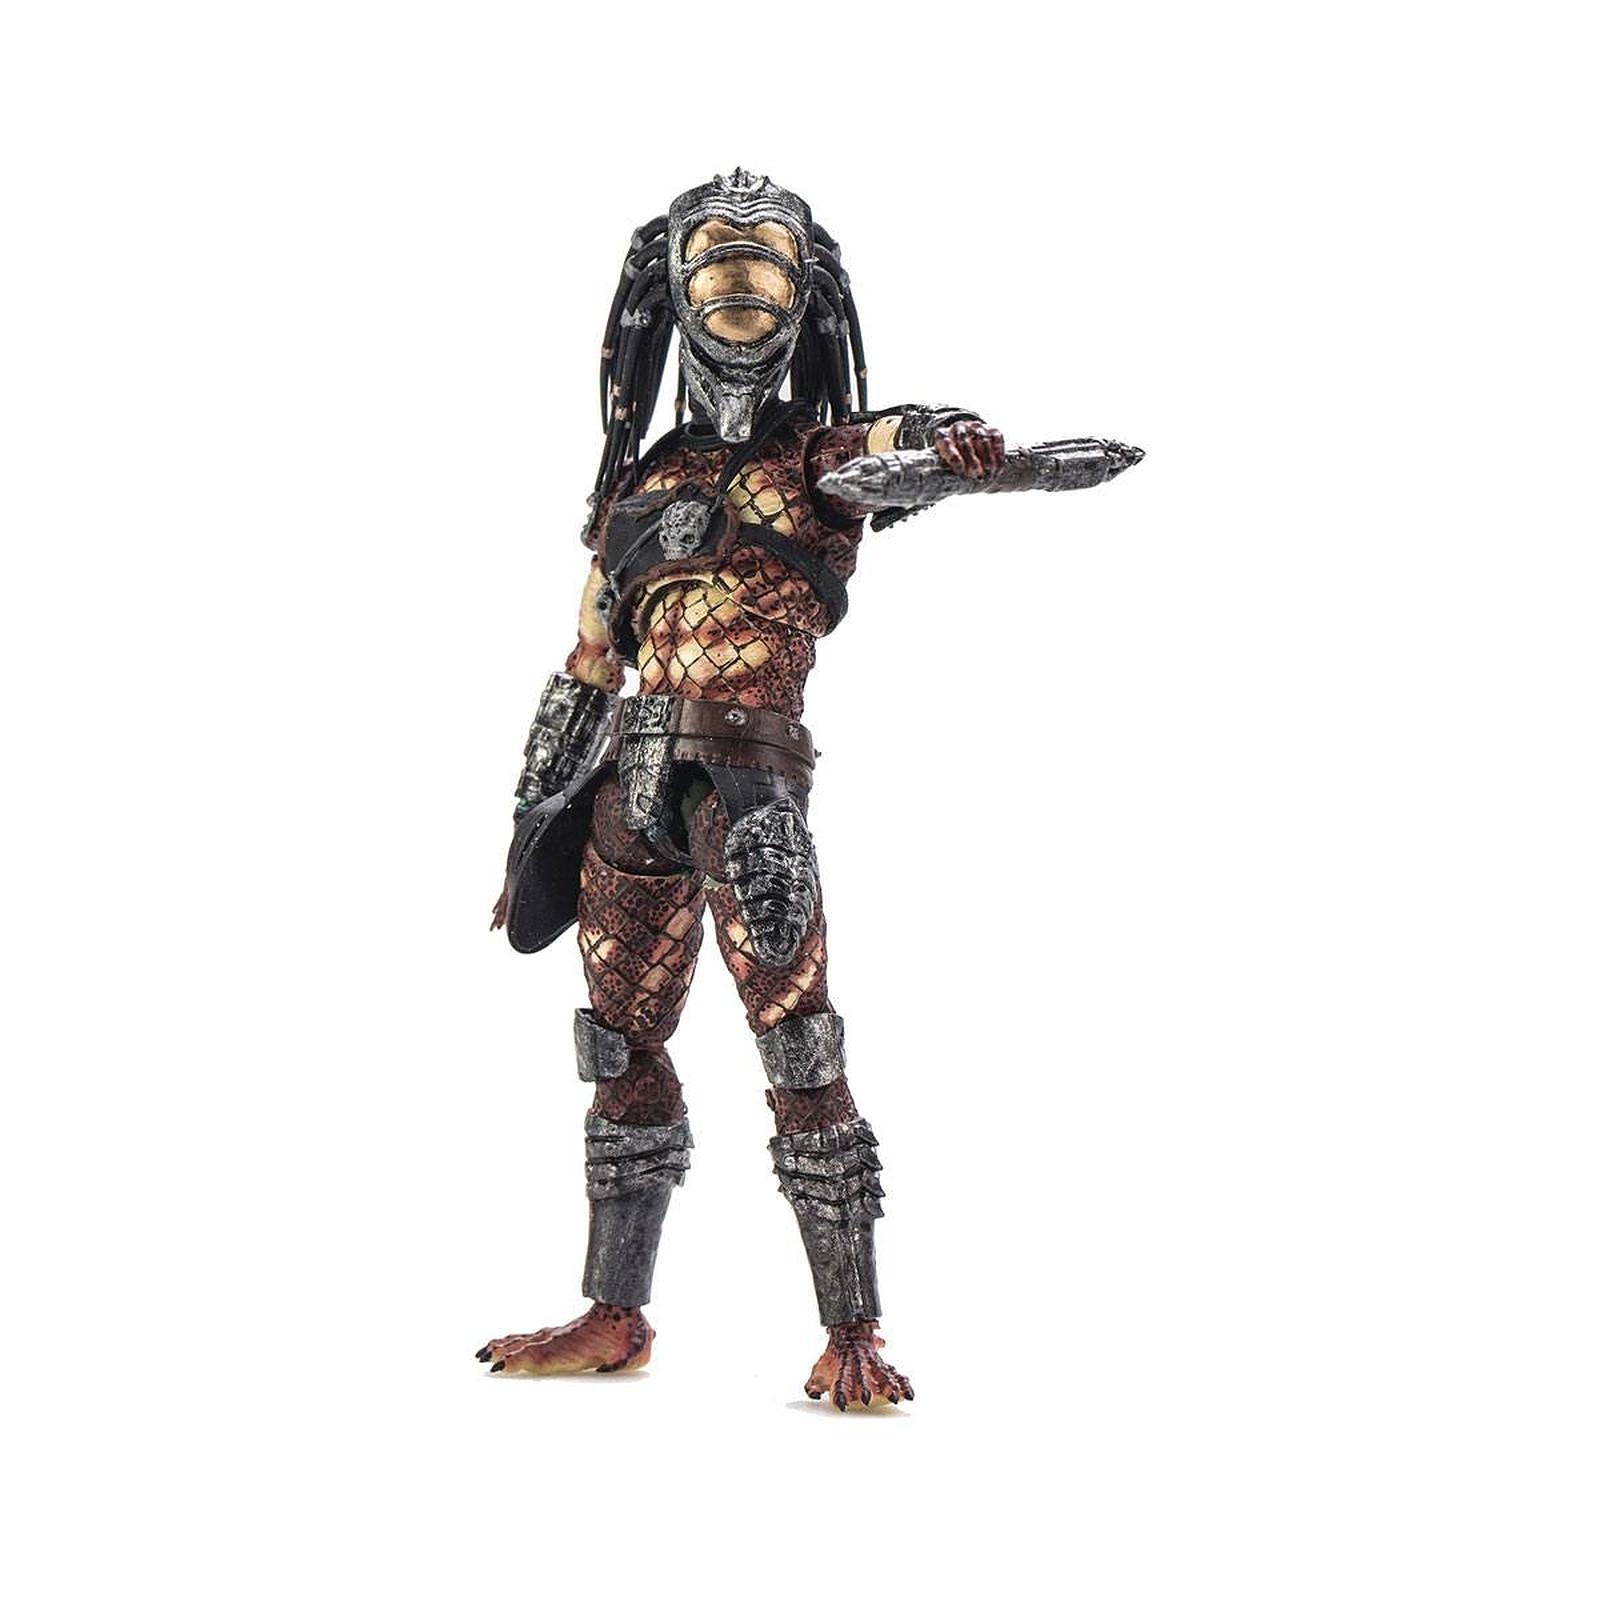 Predator 2 - Figurine 1/18 Boar  Previews Exclusive 11 cm